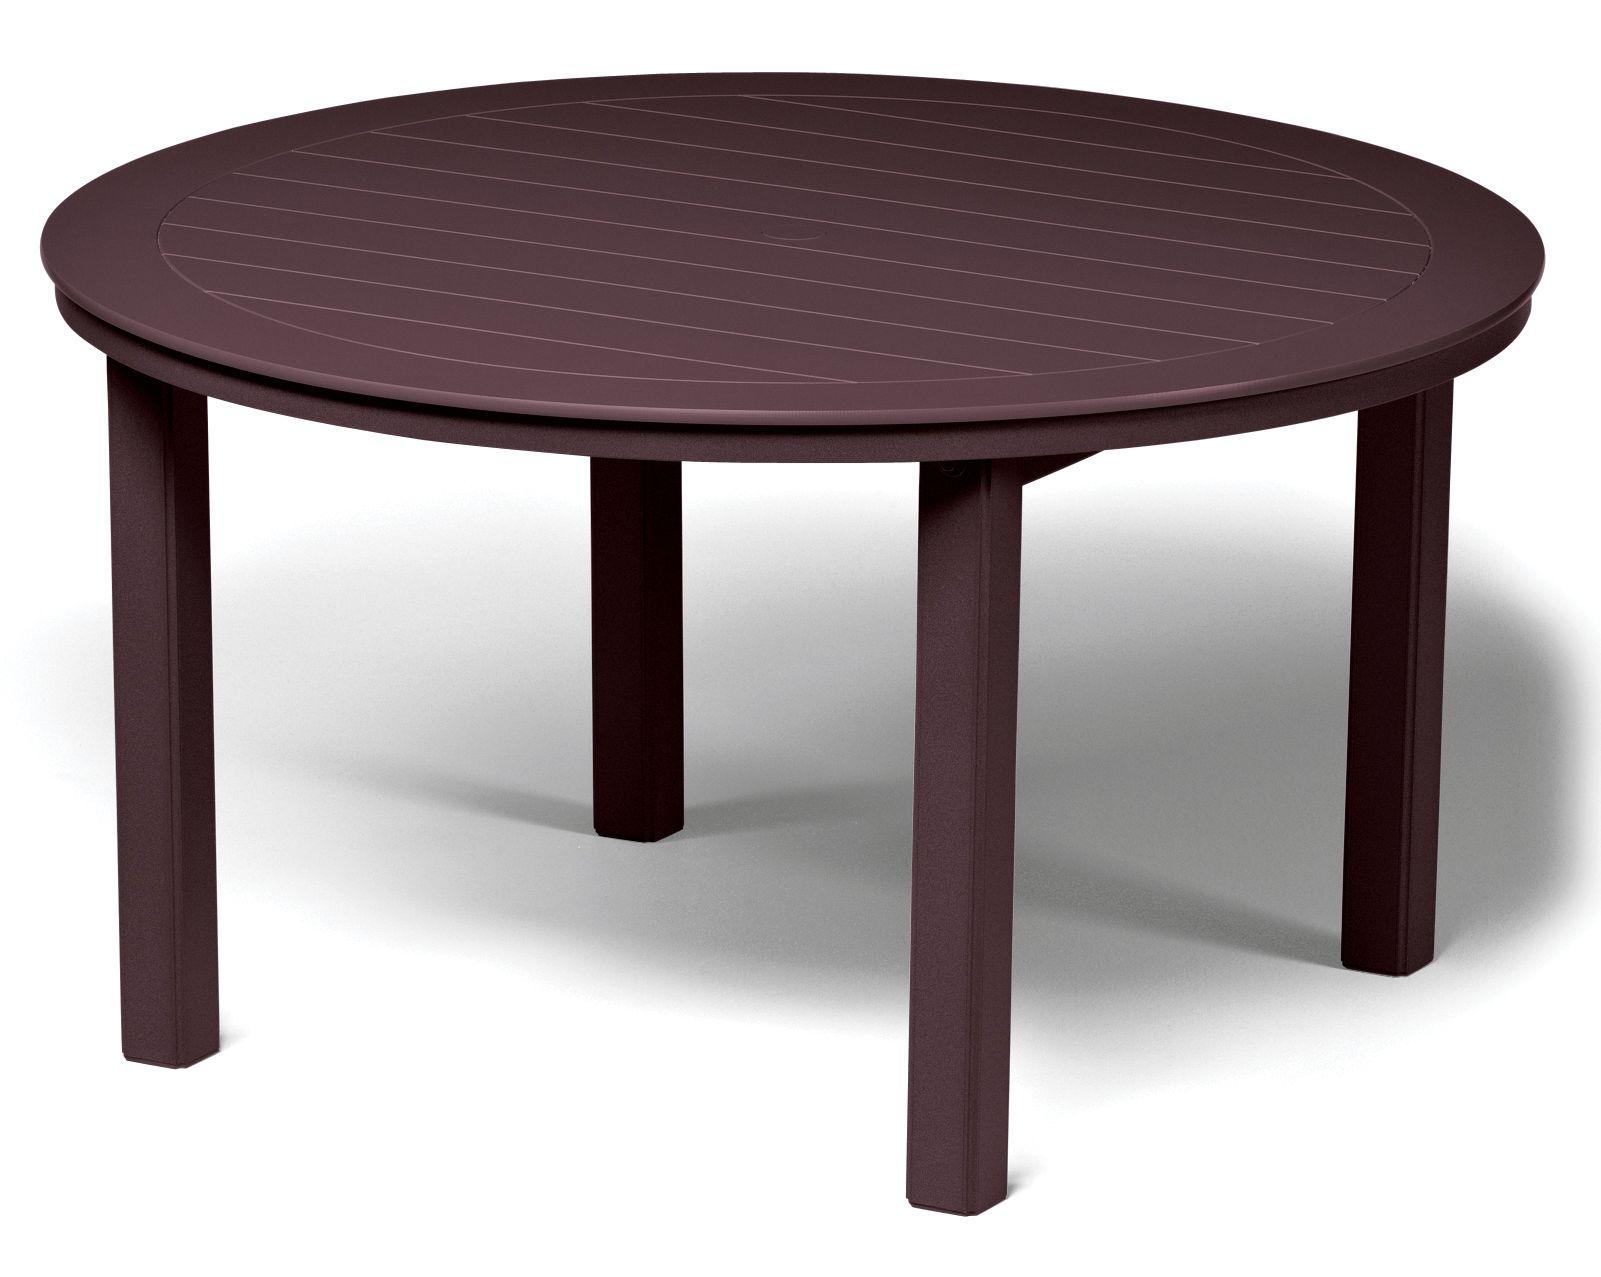 Marine grade polymer patio furniture patio decor pinterest